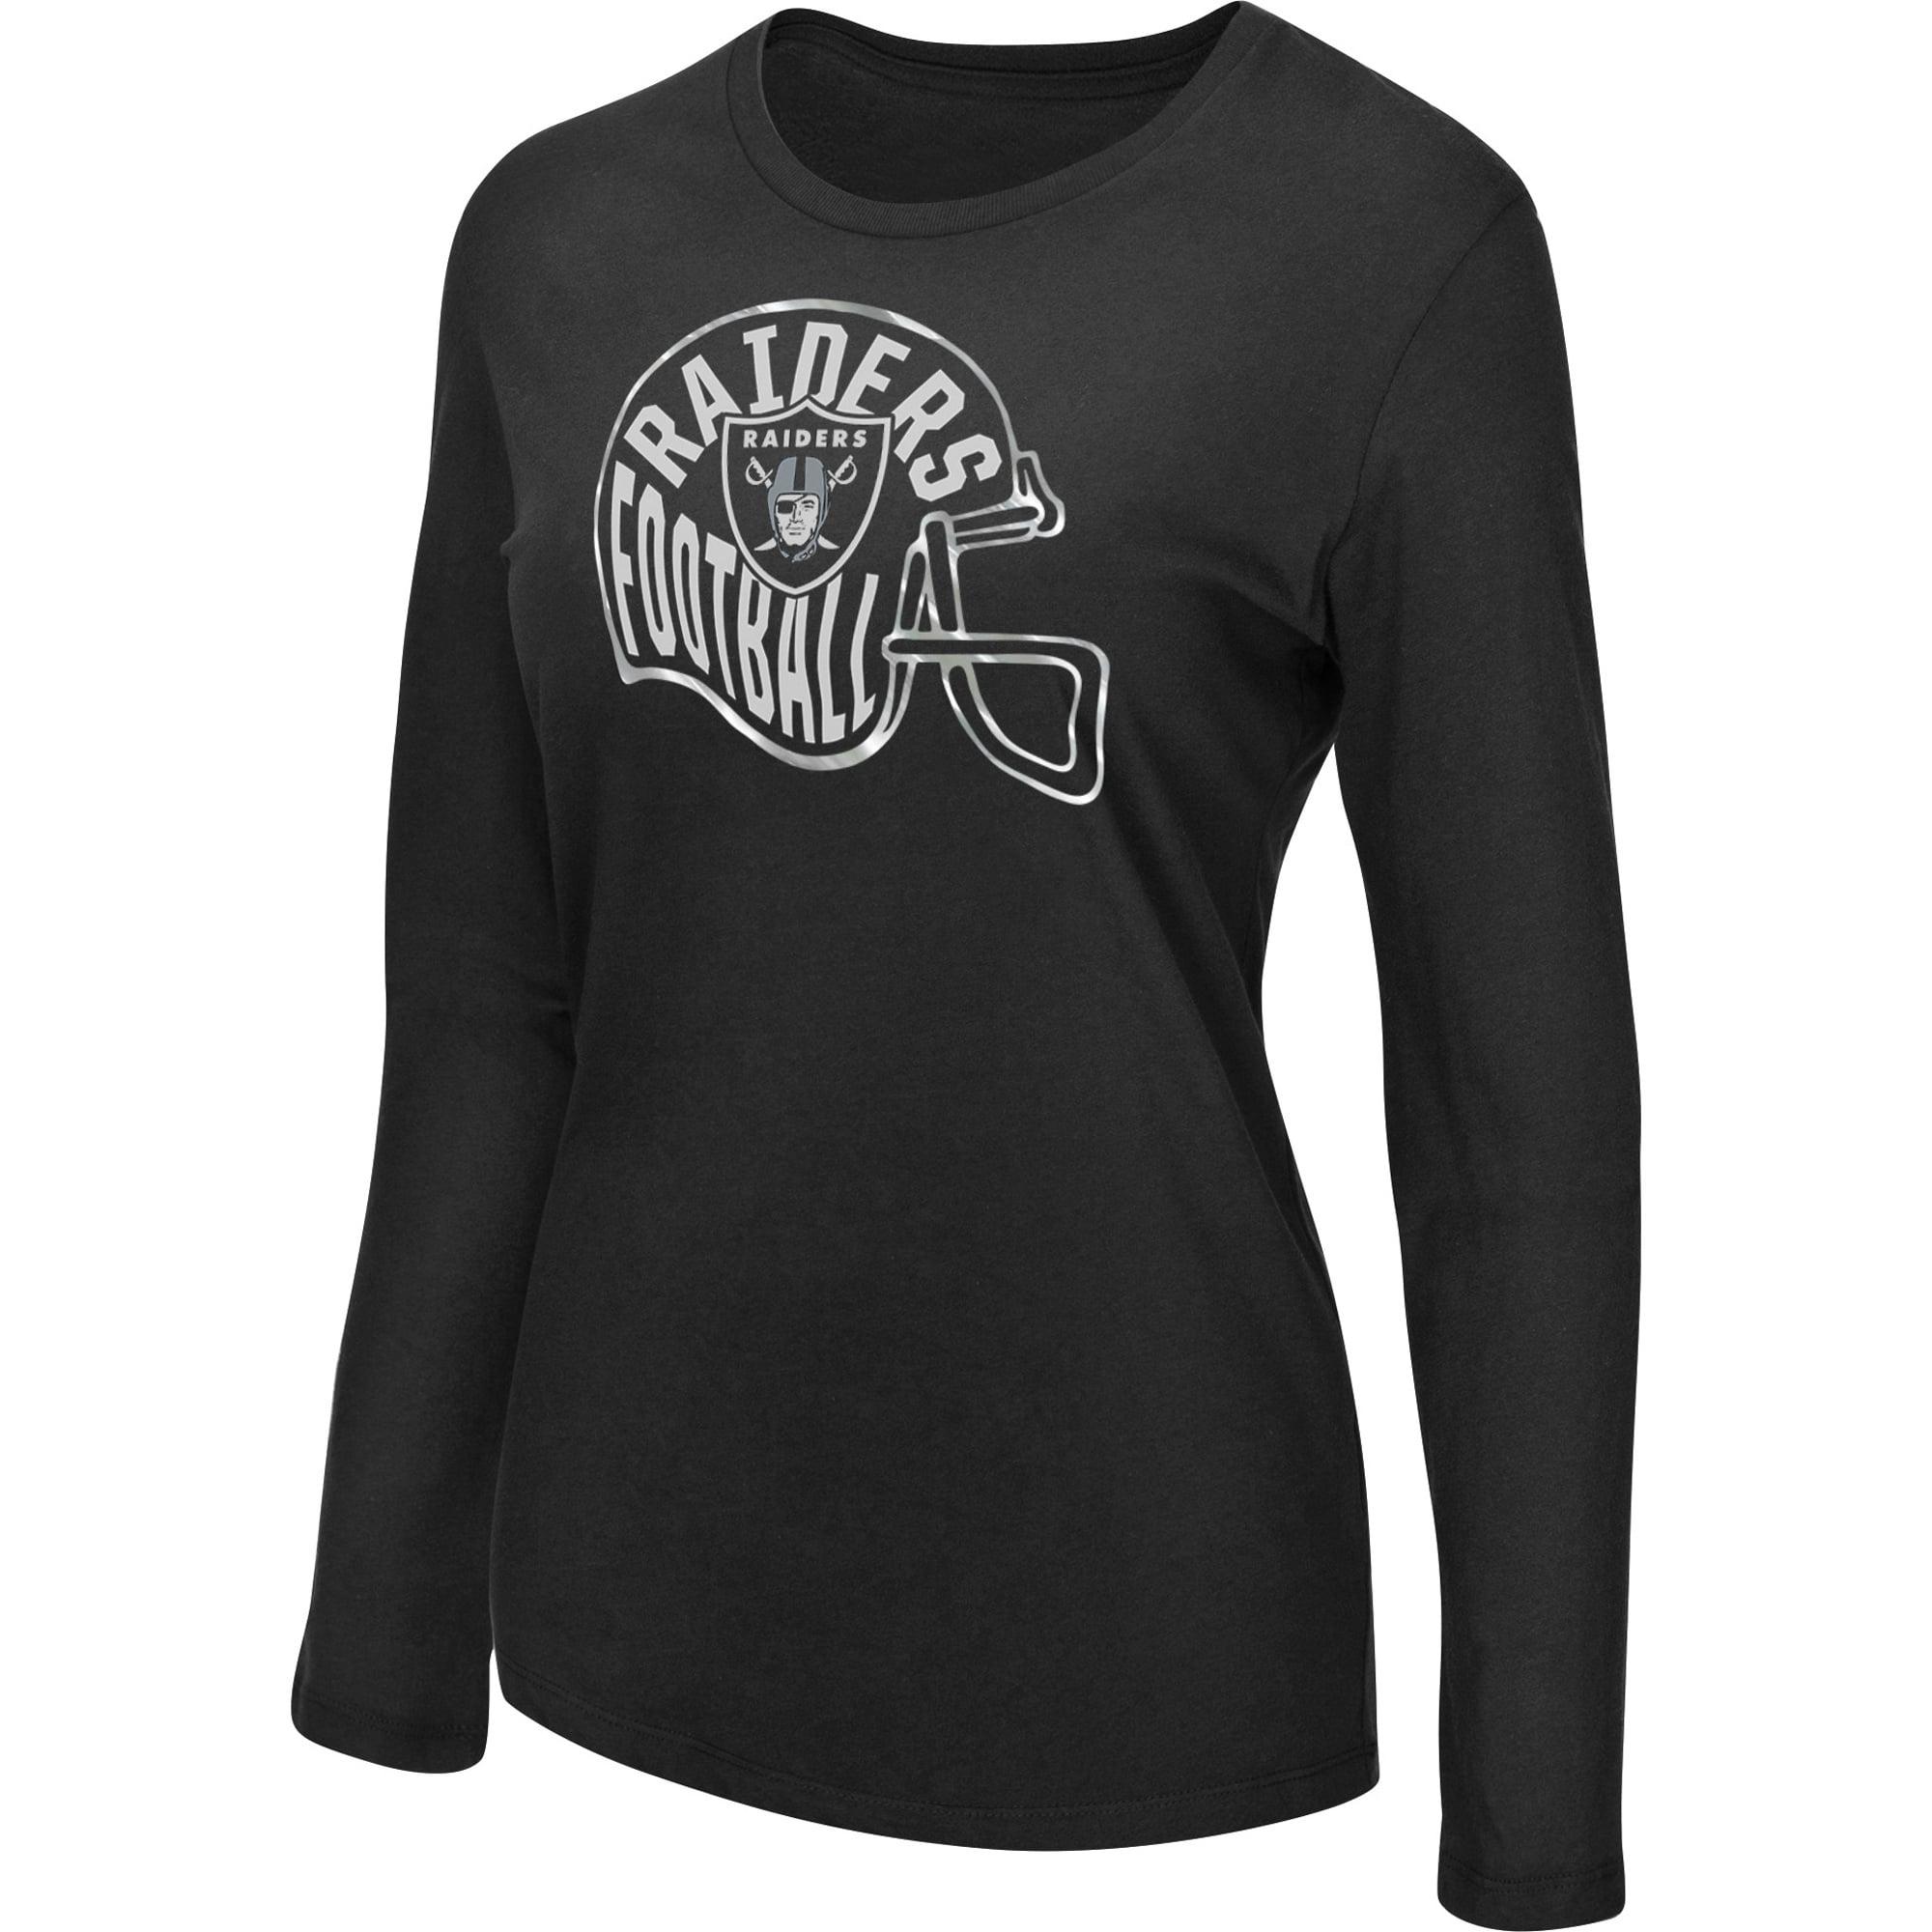 Women's Majestic Black Oakland Raiders Turn it Loose Long Sleeve T-Shirt